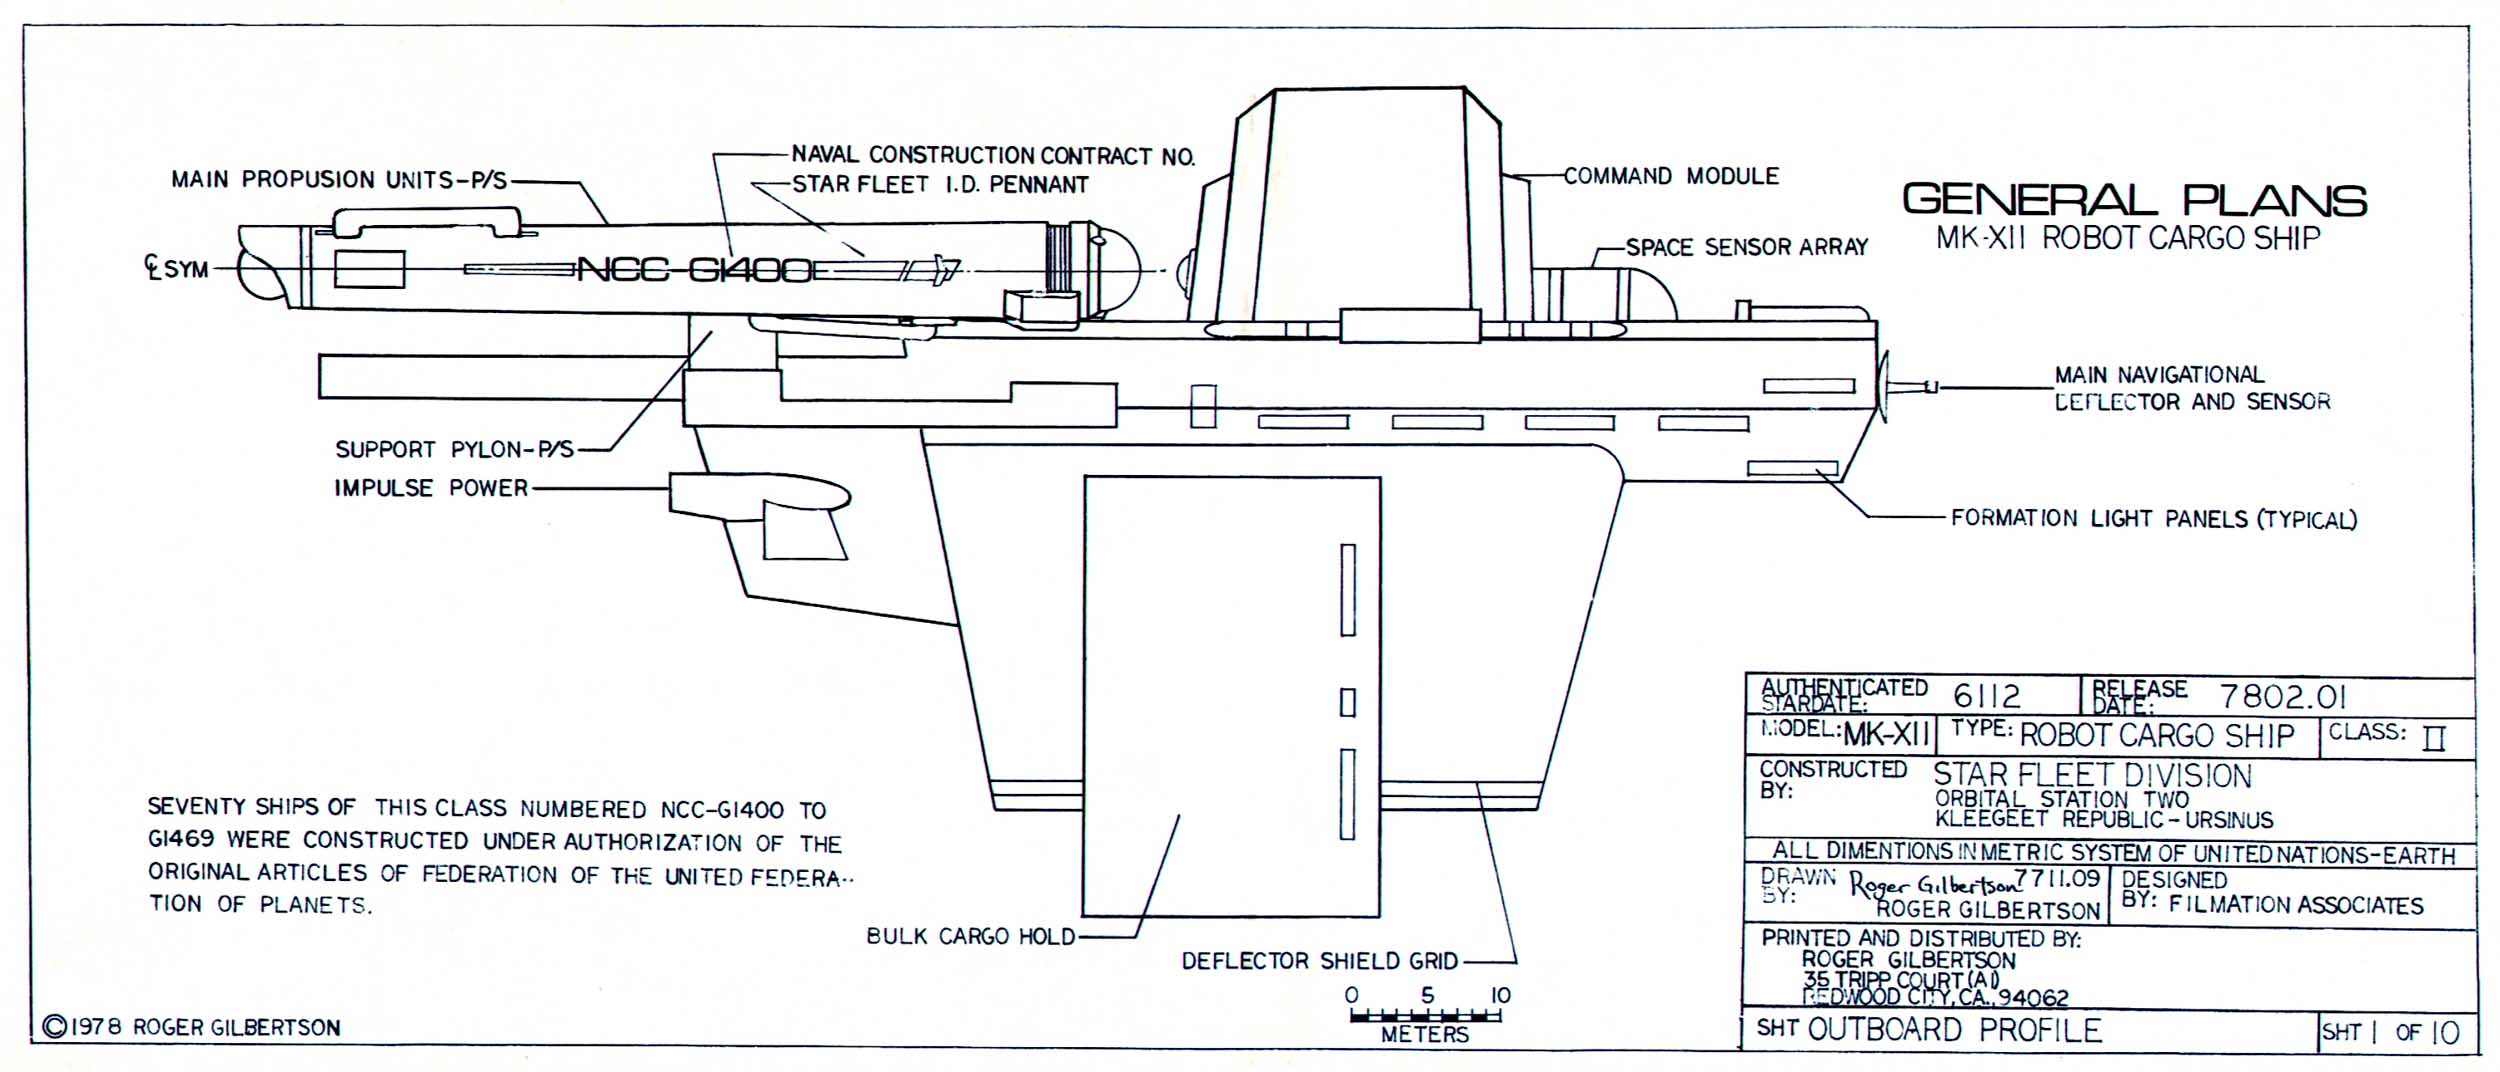 Cargo Ship Blueprint : Star trek blueprints general plans mk xii robot cargo